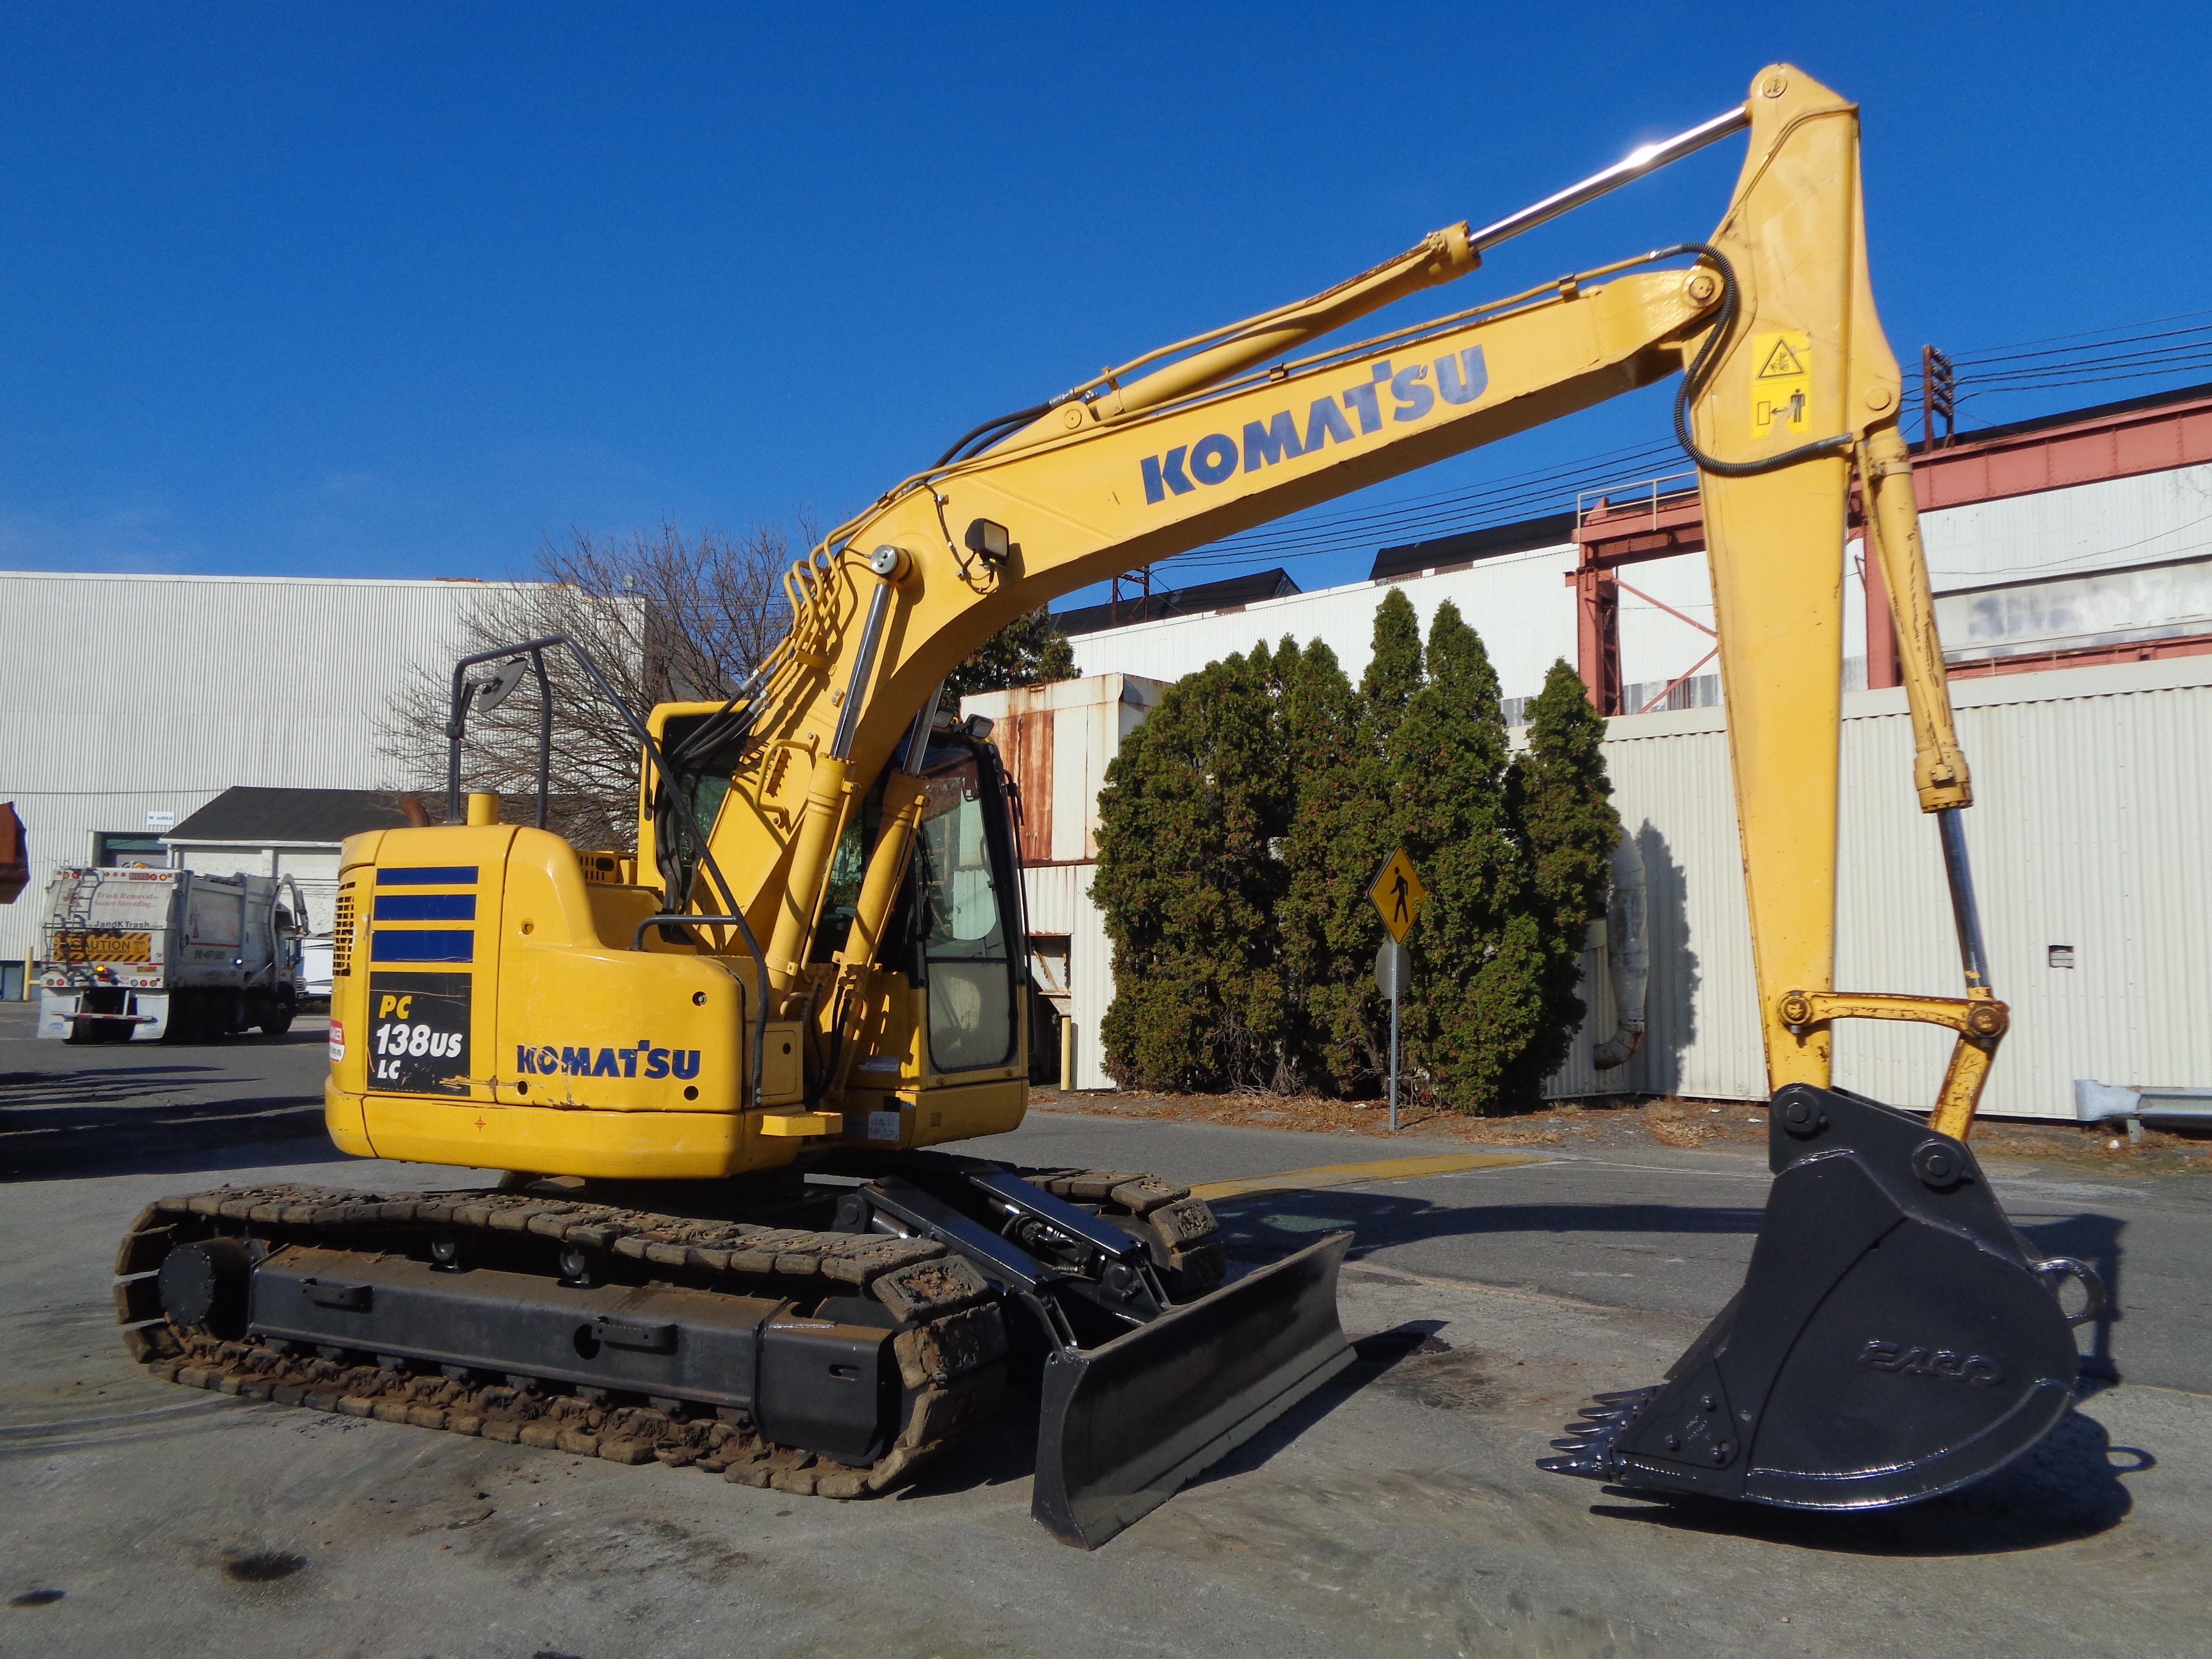 Lot 26 - 2015 Komatsu PC138USLC-10 Excavator